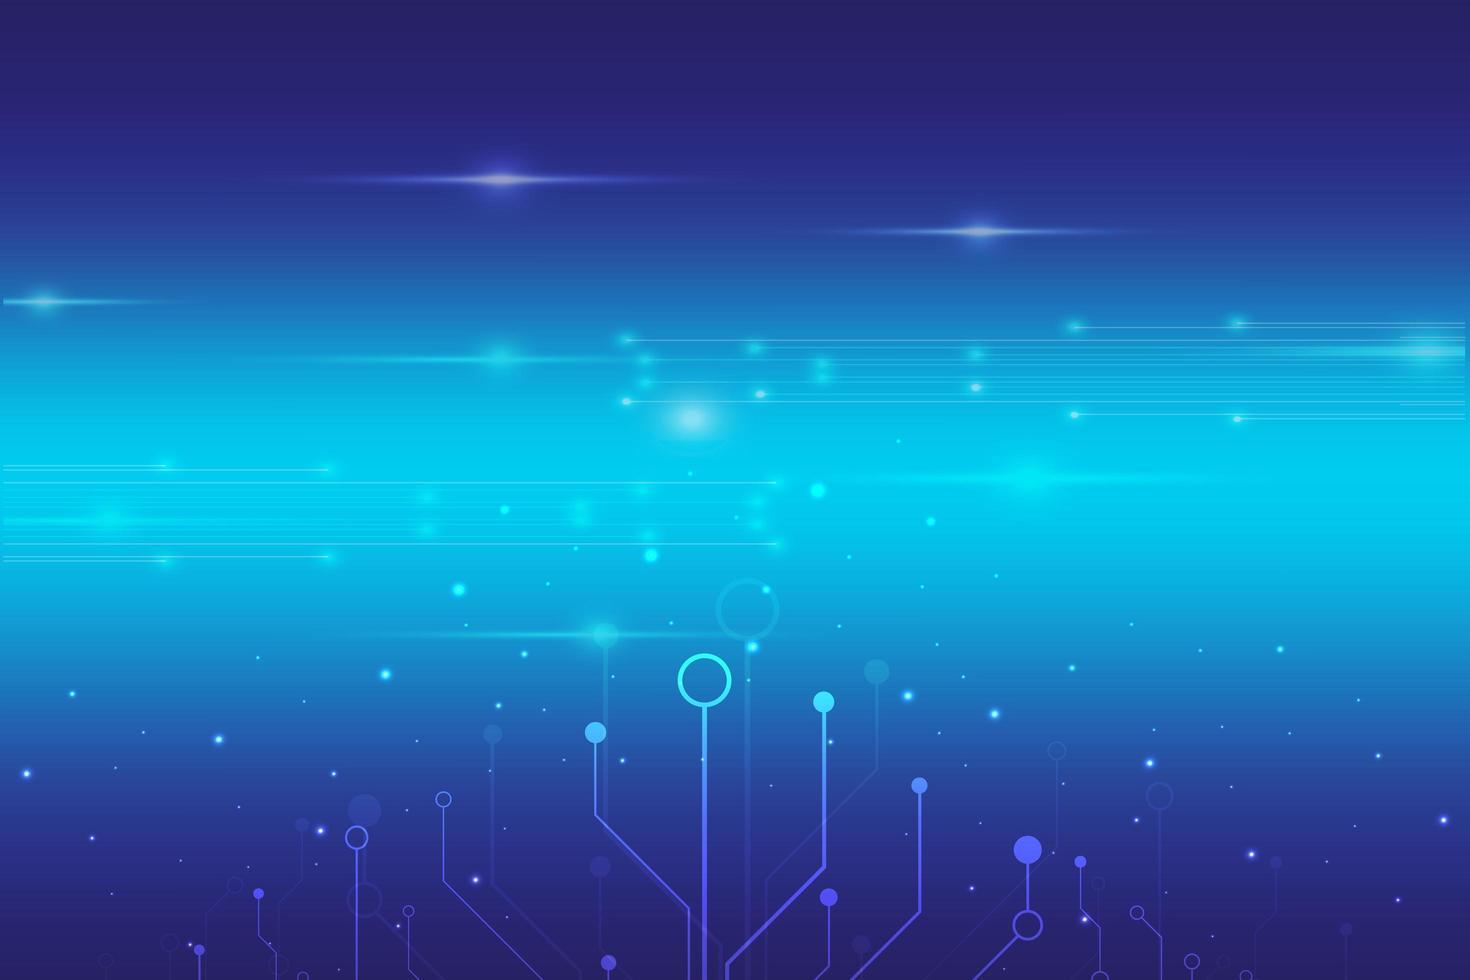 abstracte digitale technologie blauwe achtergrond vector